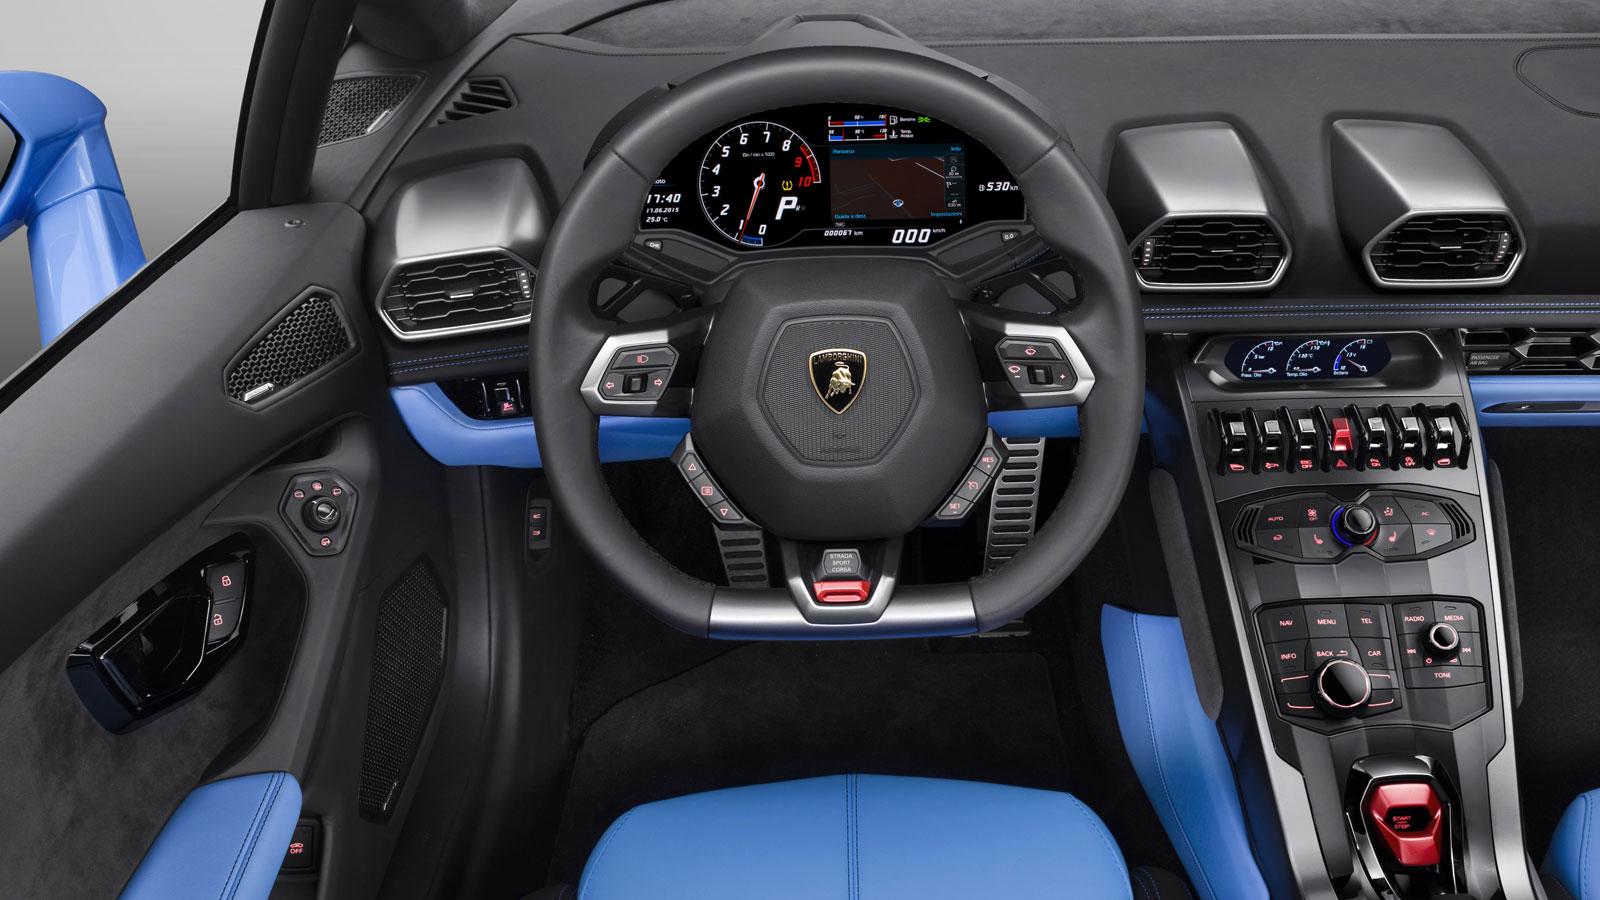 Lamborghini Huracan AWD Spyder - Inspiring Technology image 9